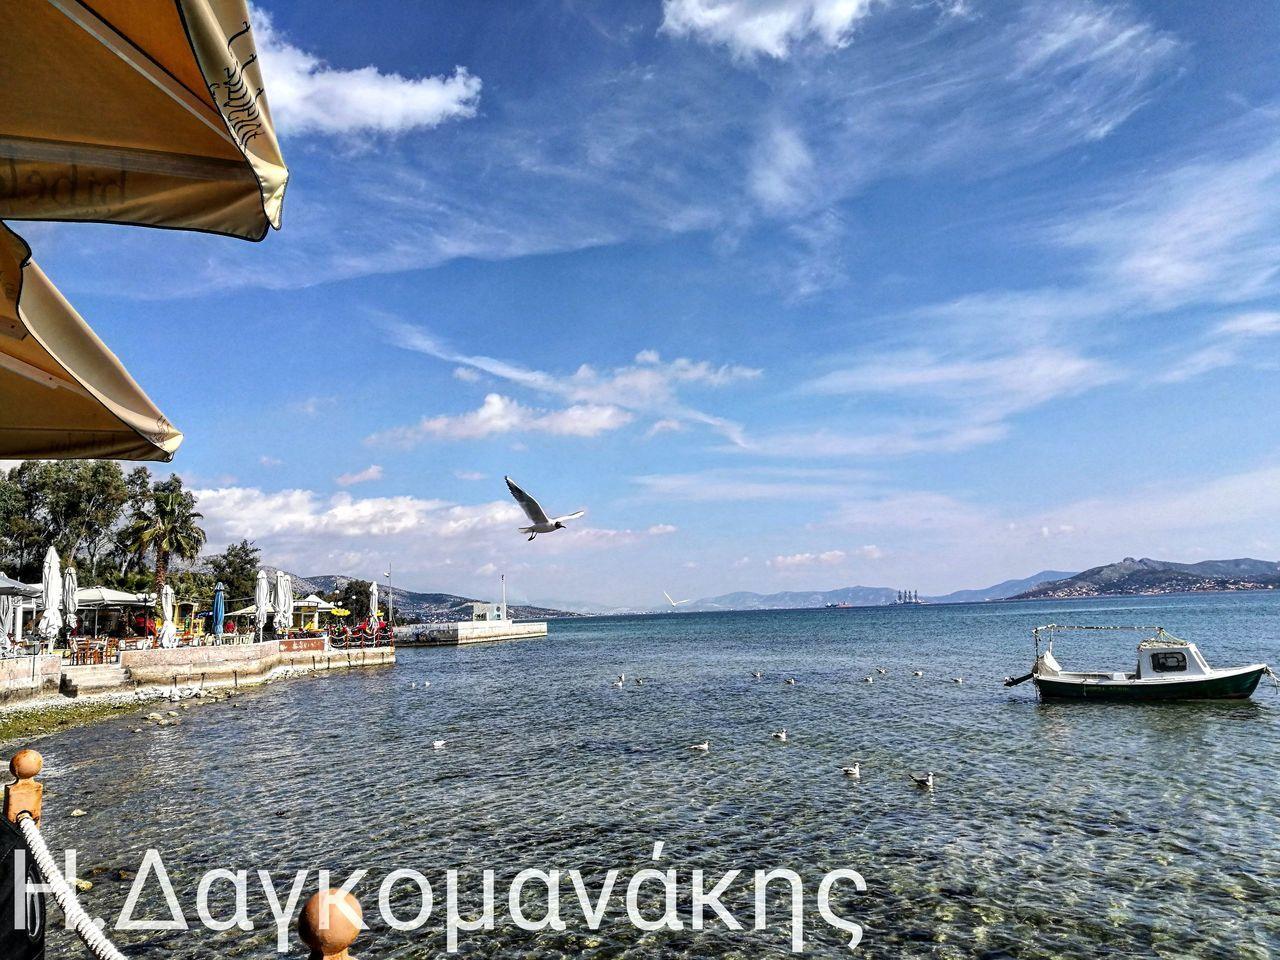 Cloud - Sky Sea Nature Nea Peramos Photocontestgr GREECE ♥♥ Sky Colors Hellas Sky Porn Seagulls And Sea Mountains Sky And Clouds